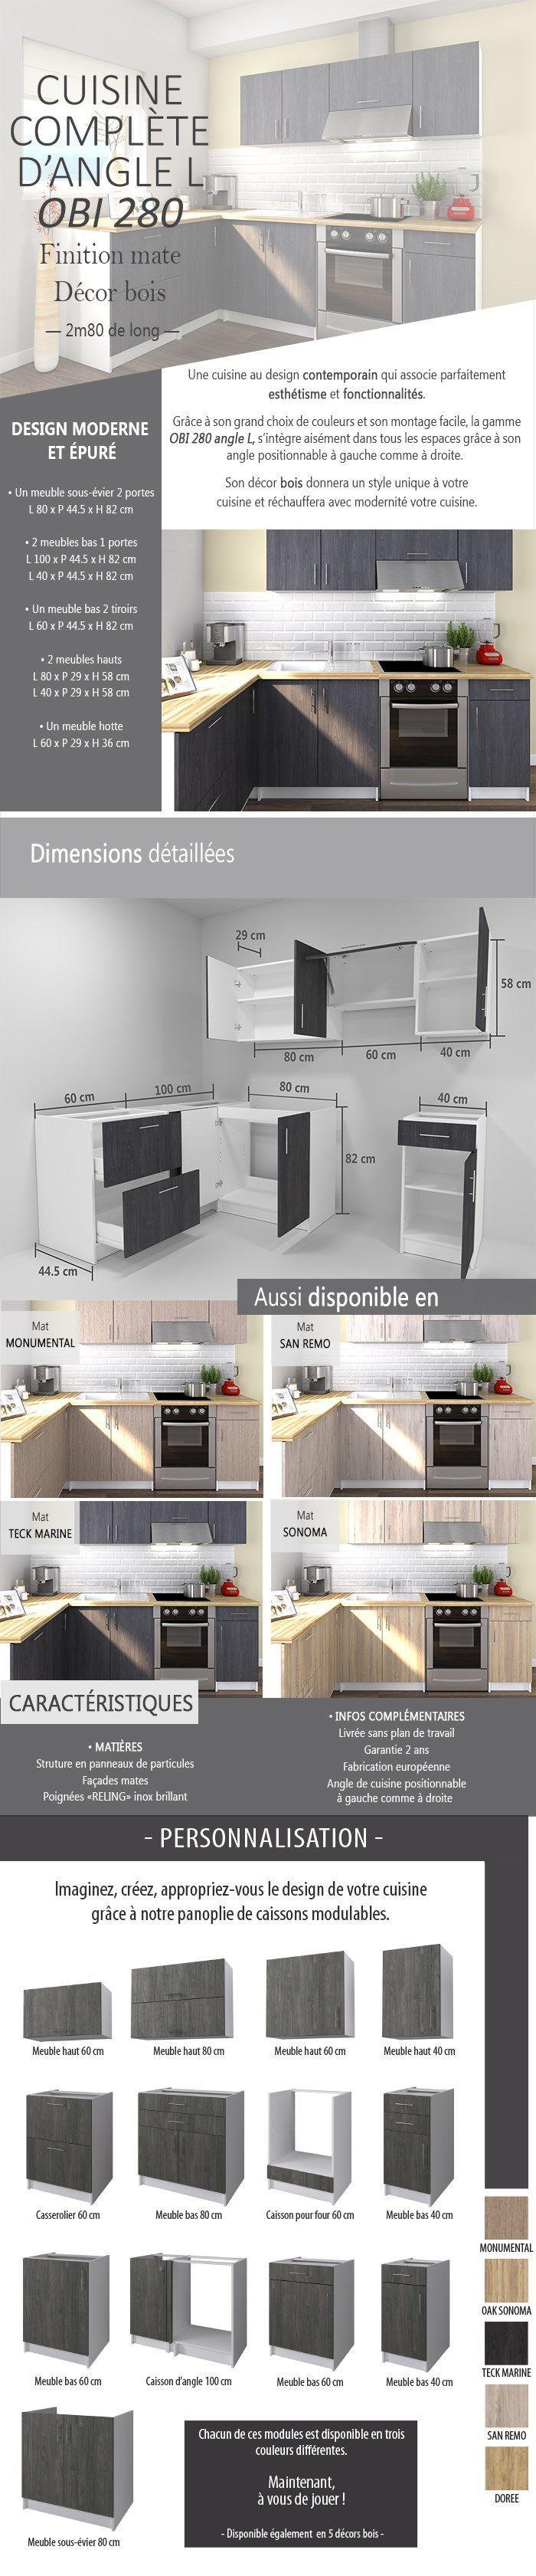 obi cuisine compl te d 39 angle l 280 cm d cor teck marine. Black Bedroom Furniture Sets. Home Design Ideas